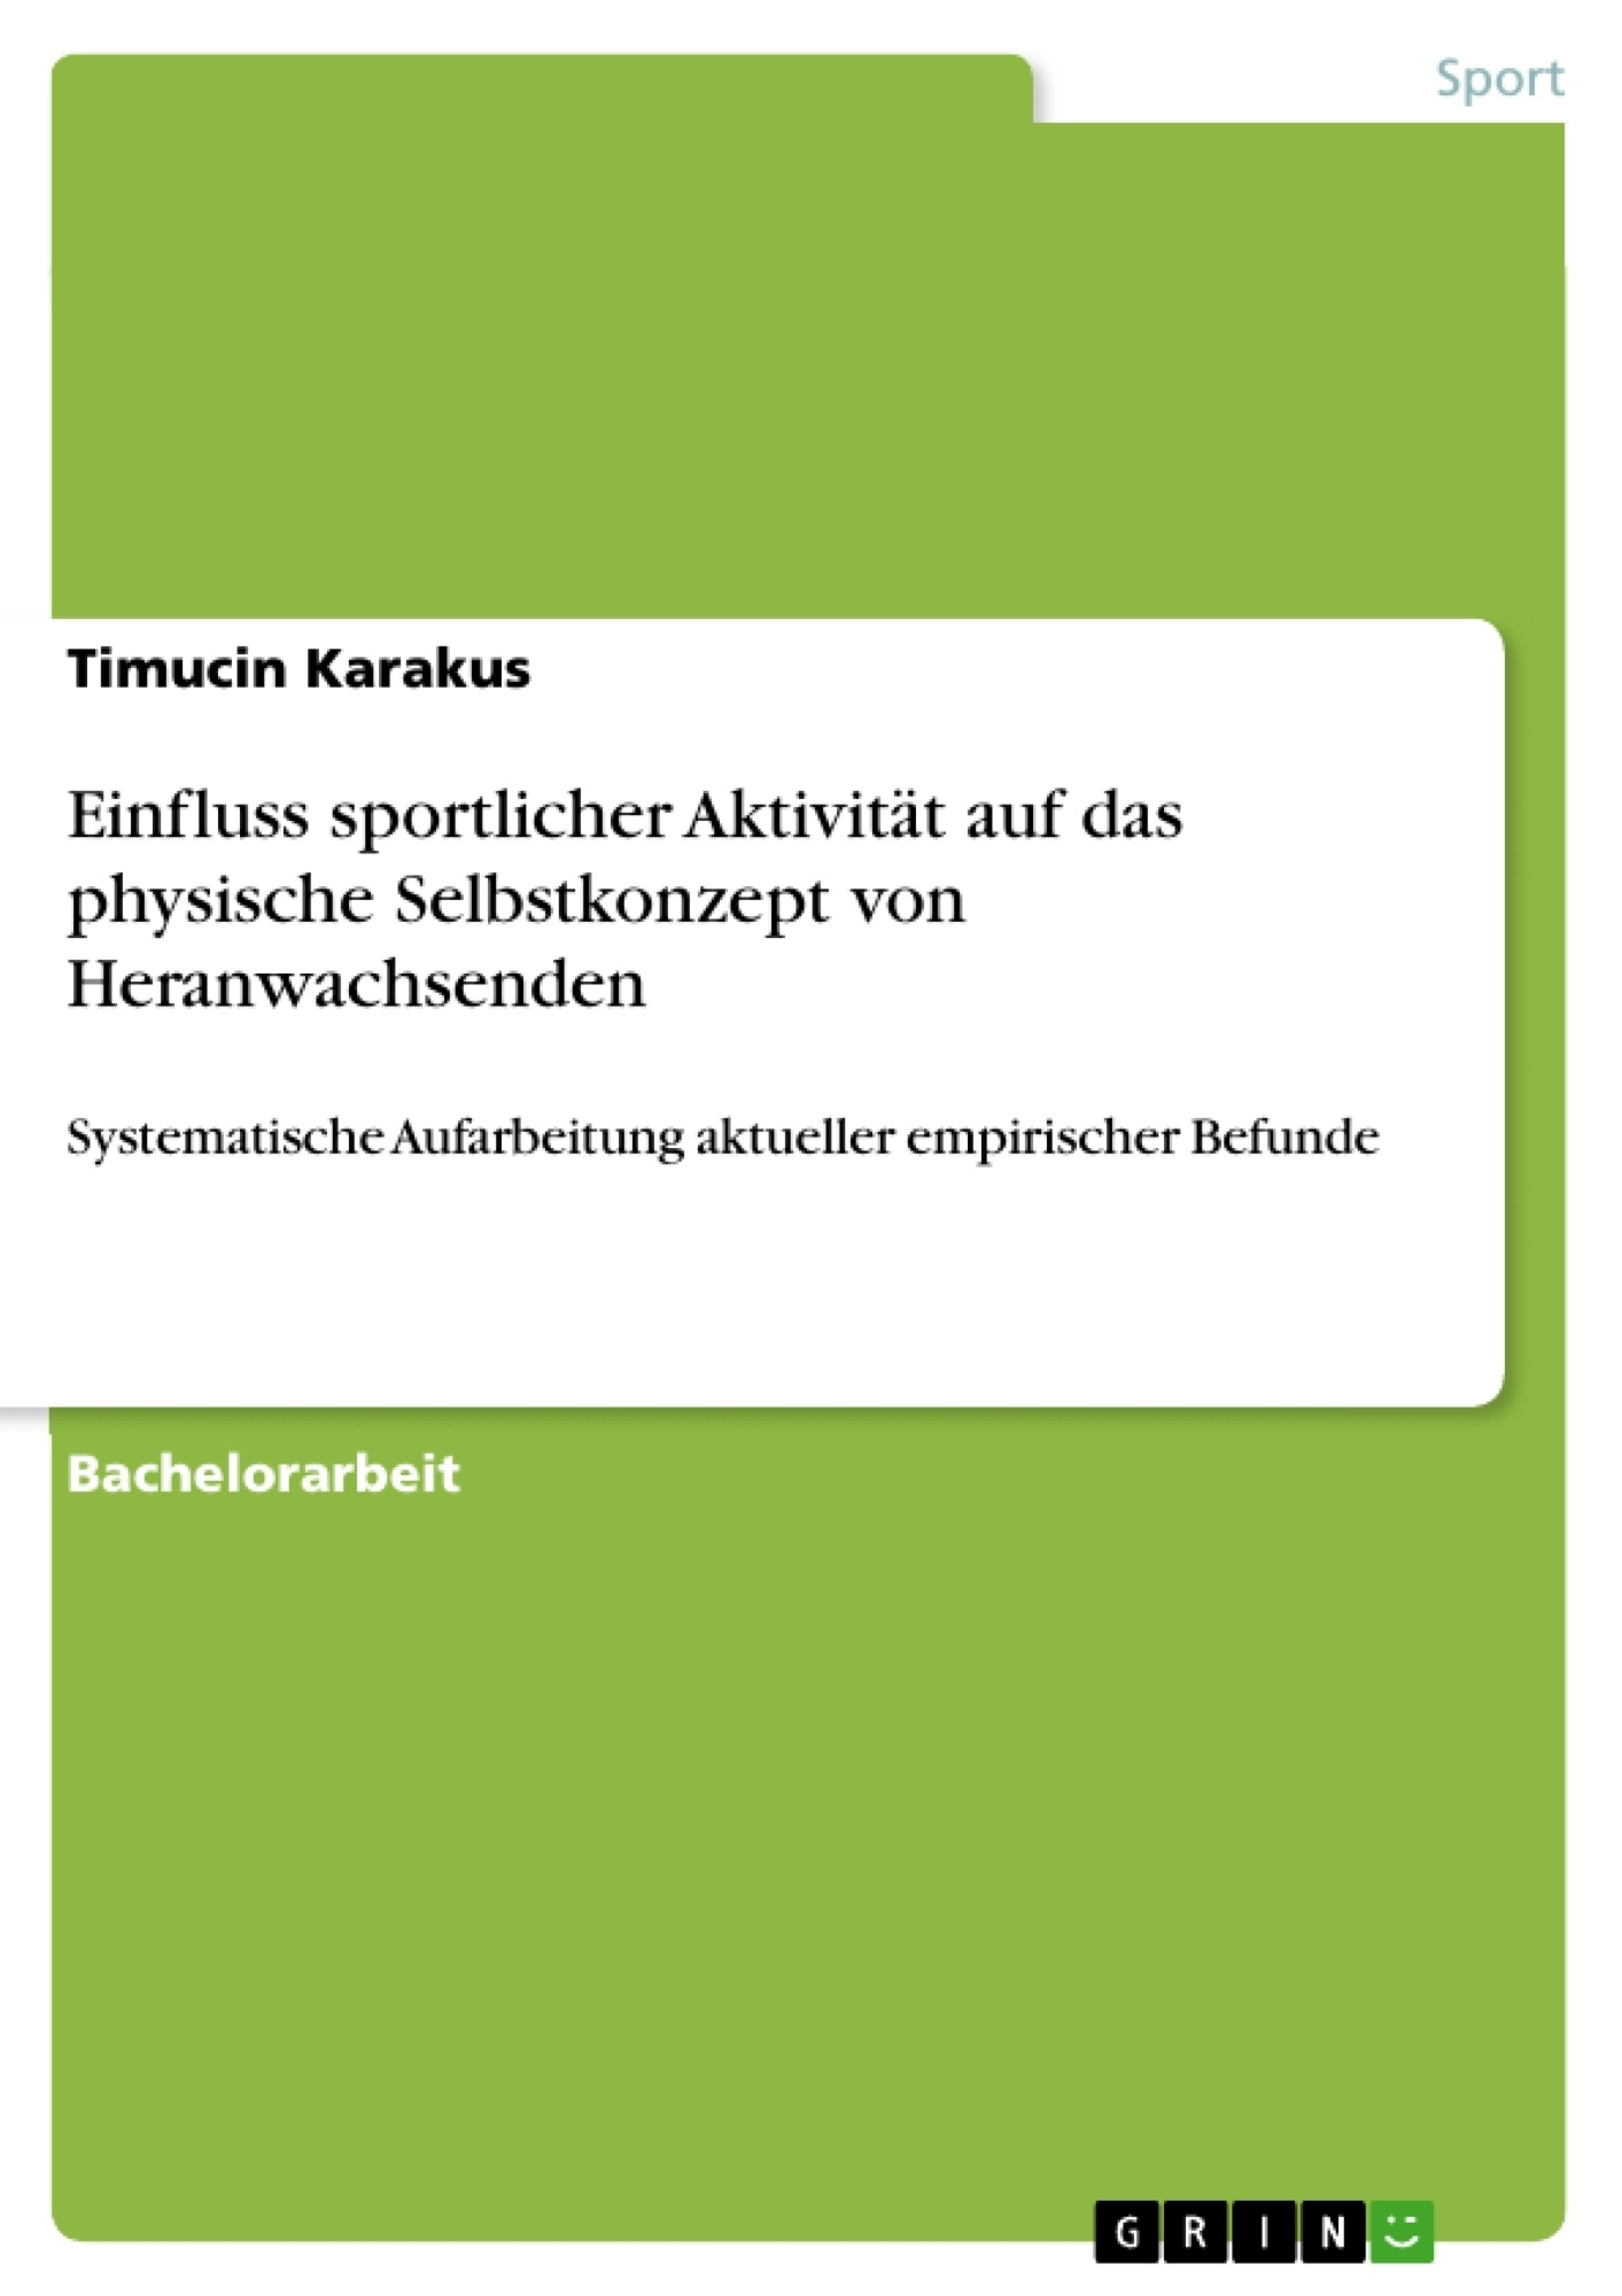 kants prolegomena essay Lectures on kant's prolegomena to any future metaphysics 2011 even in the essays kant prolegomena.